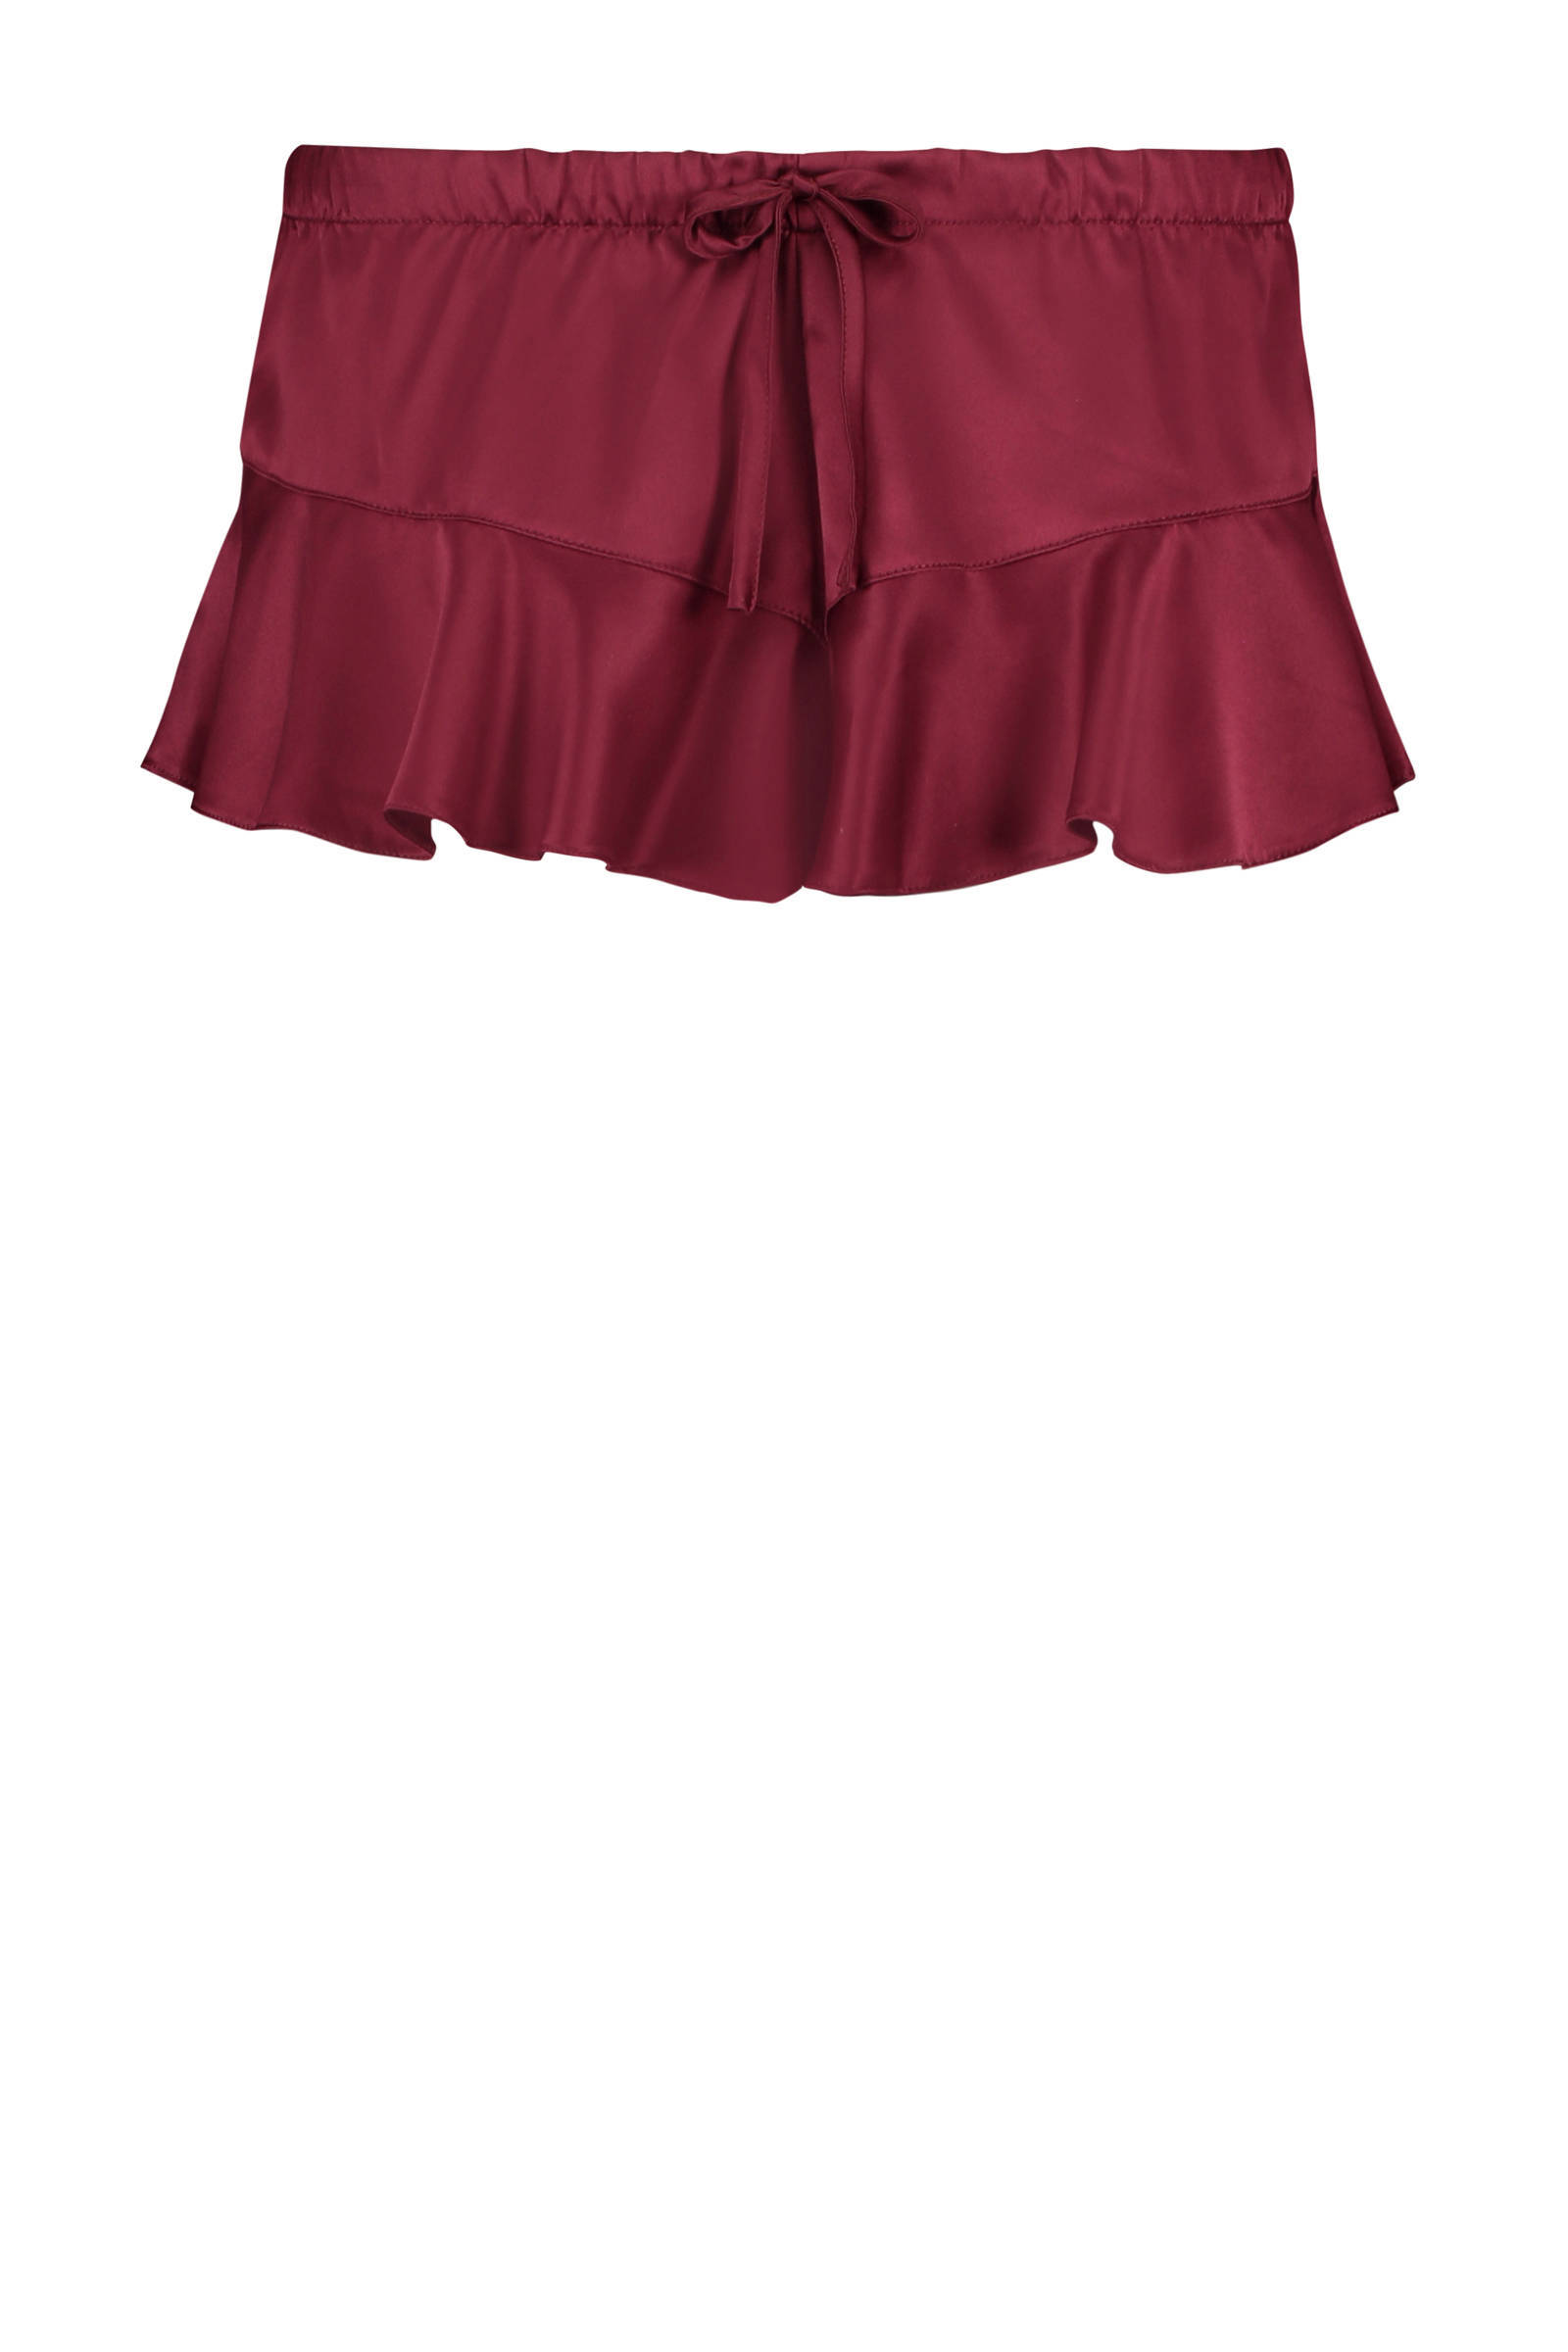 Hunkemöller satijnen pyjamashort rood (dames)